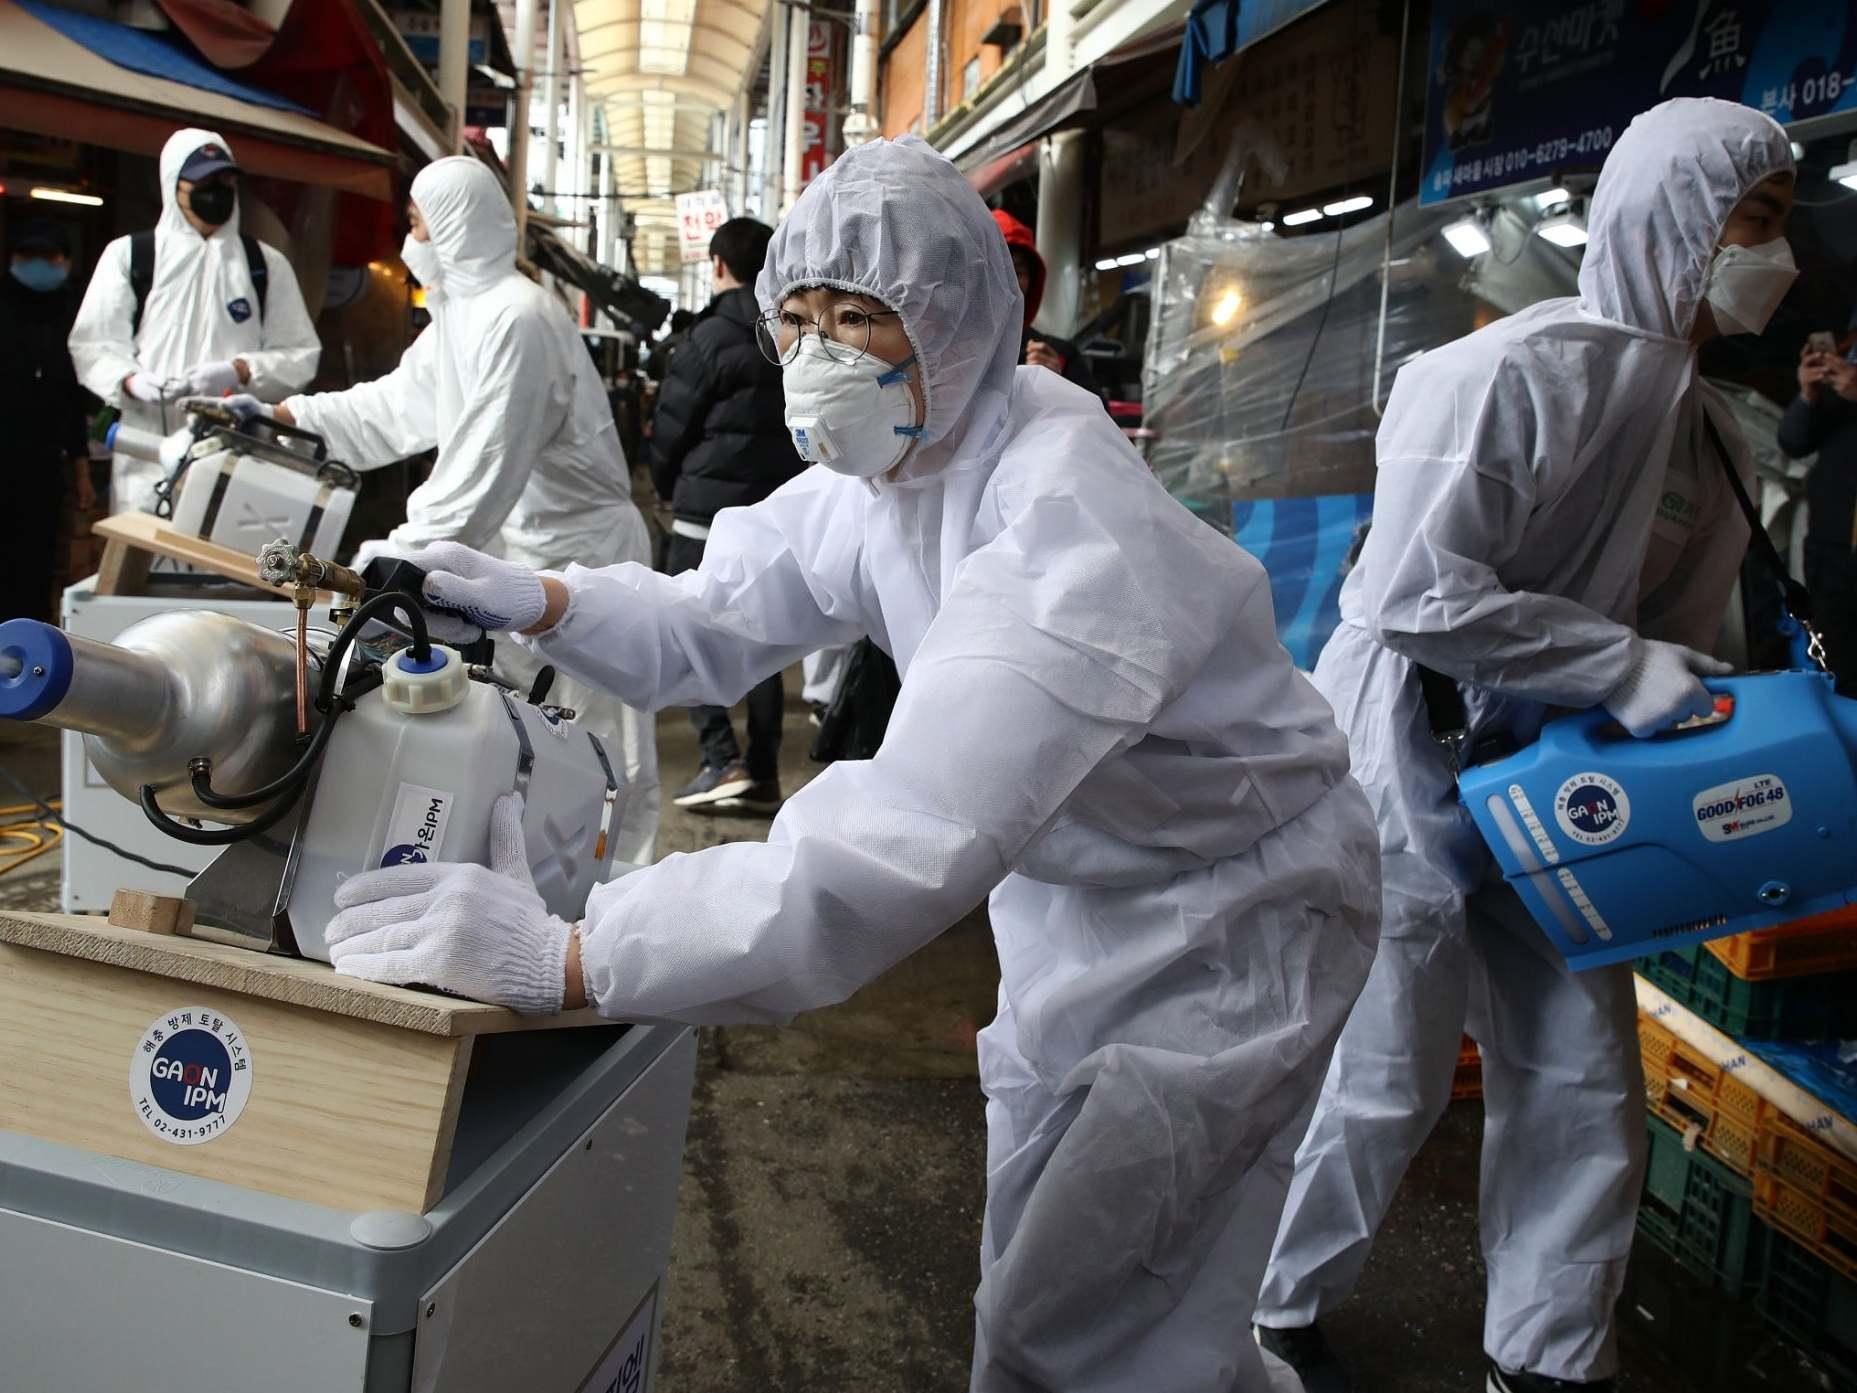 Coronavirus outbreak sweeps across Europe as US fears pandemic - follow live